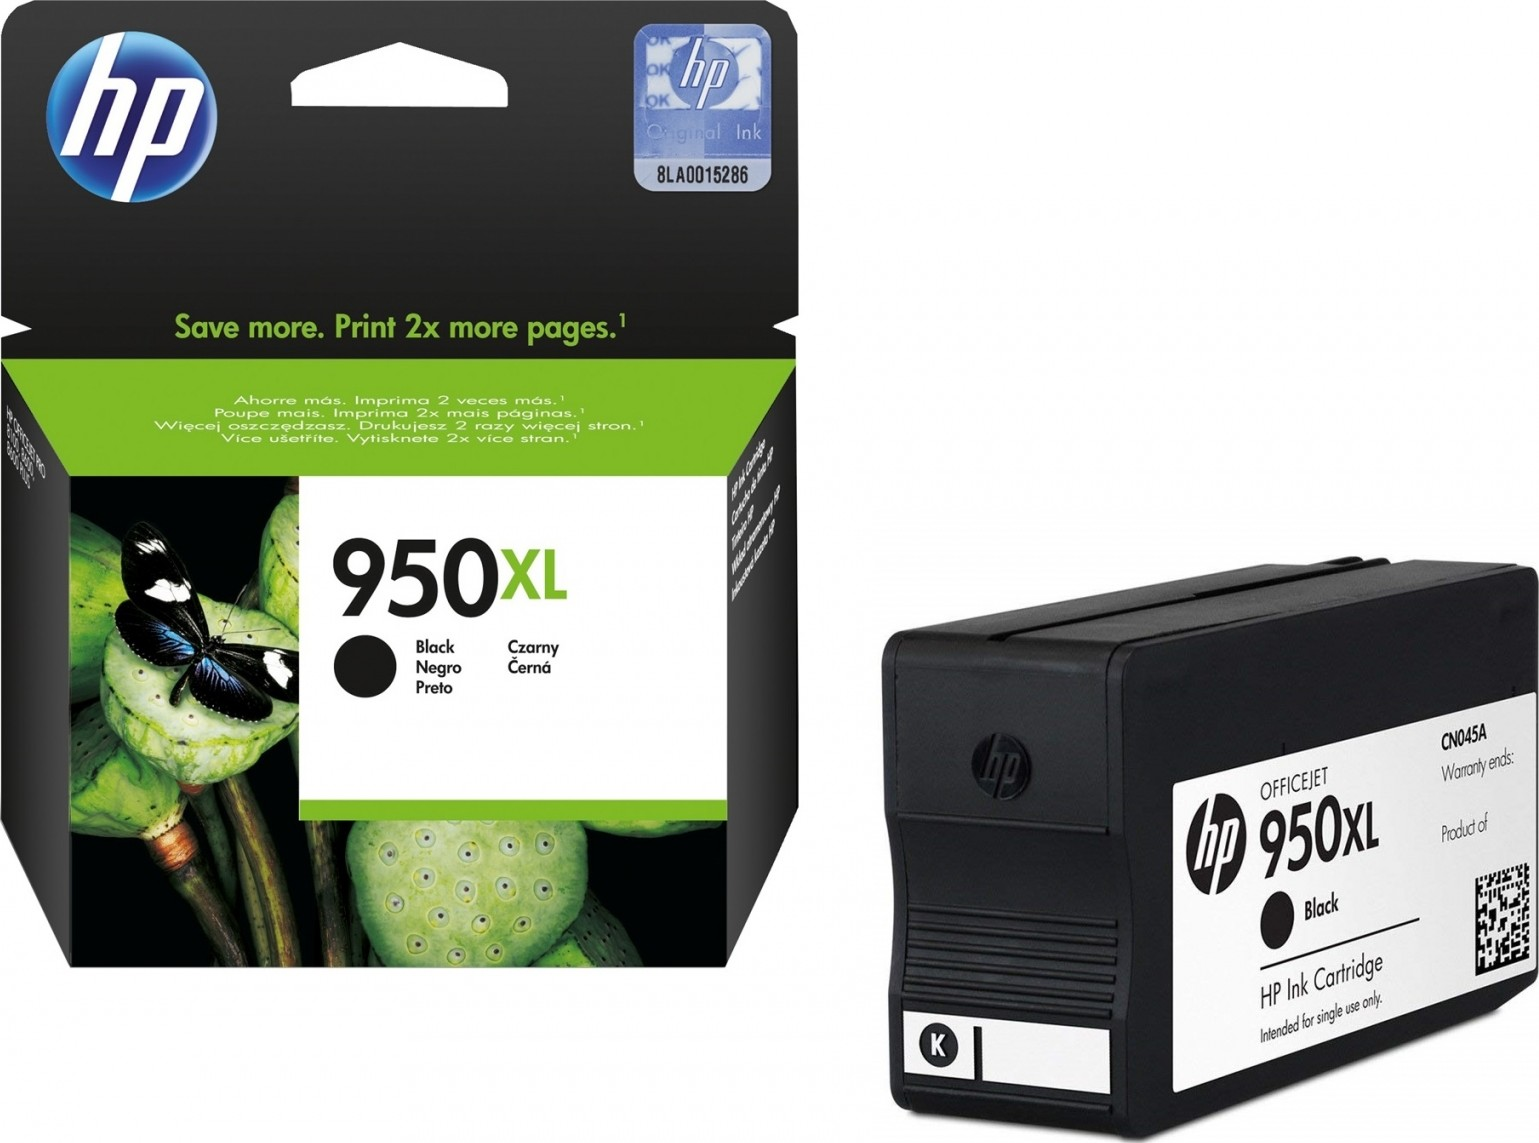 HP 950XL Black Ink Cartridge Genuine New